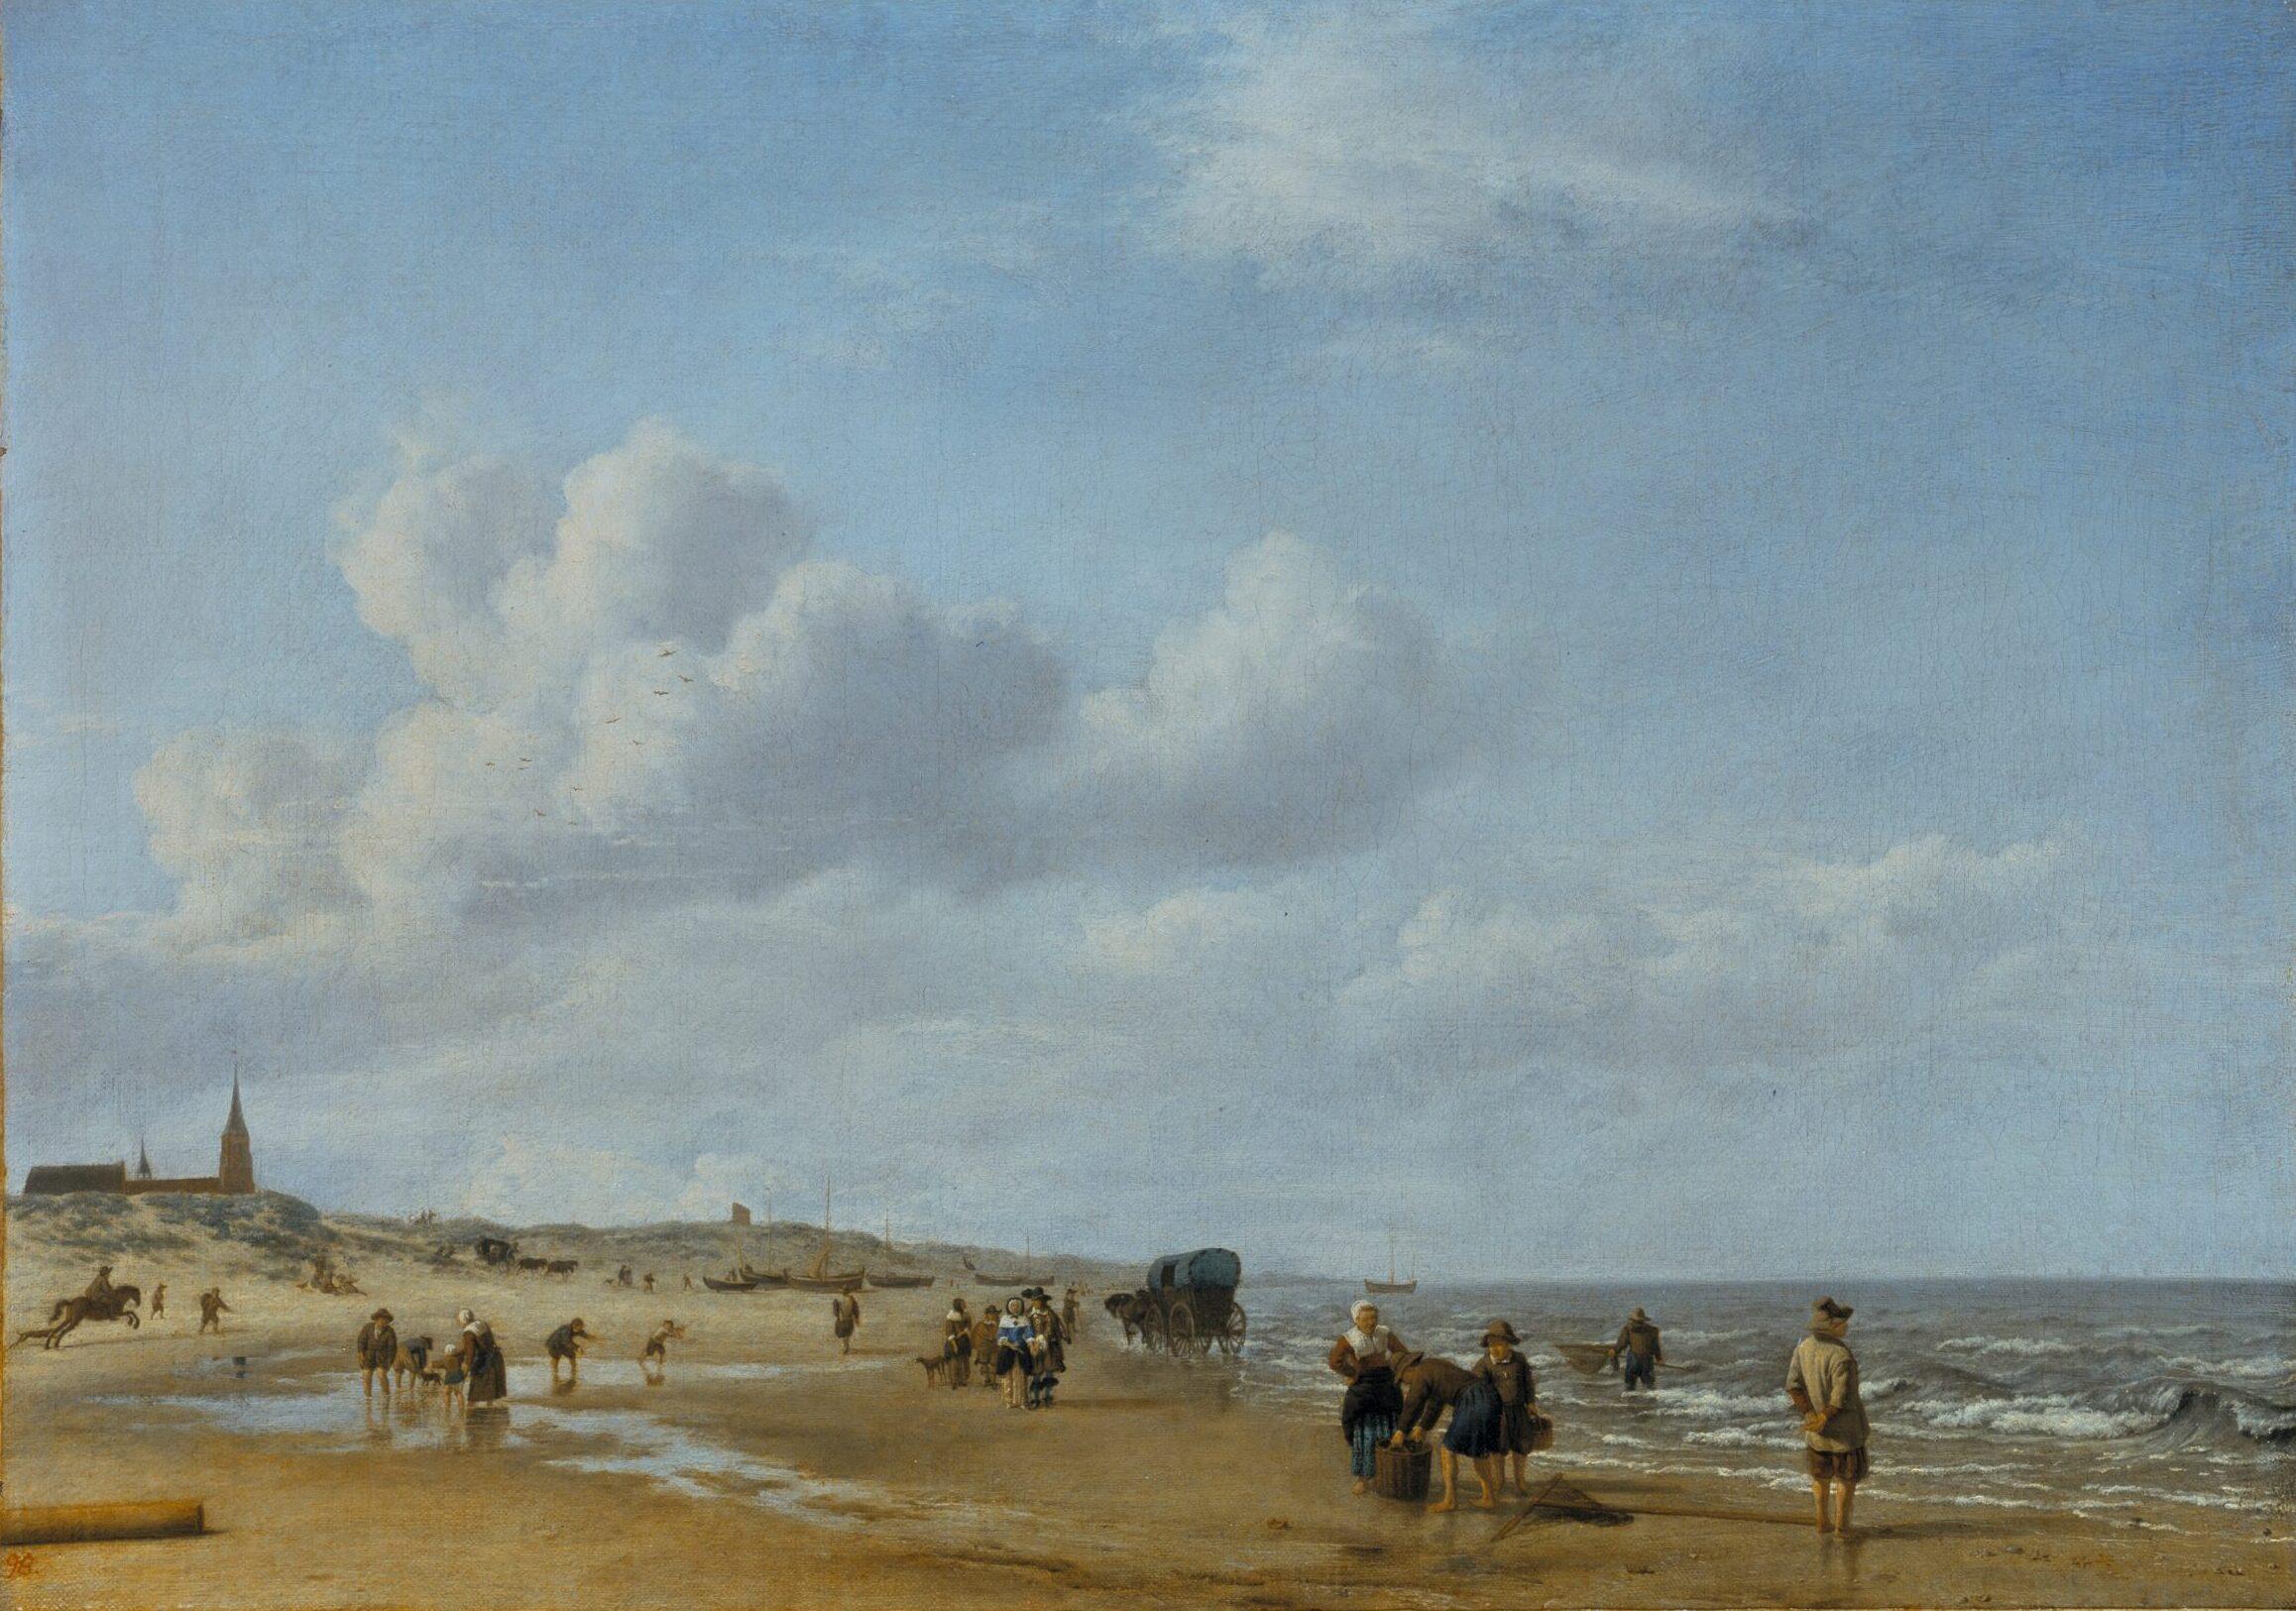 Adriaen van de Velde (1636-1672), <em>The Beach at Scheveningen</em>, 1658<br>Gemäldegalerie Alte Meister, Museumslandschaft Hessen Kassel